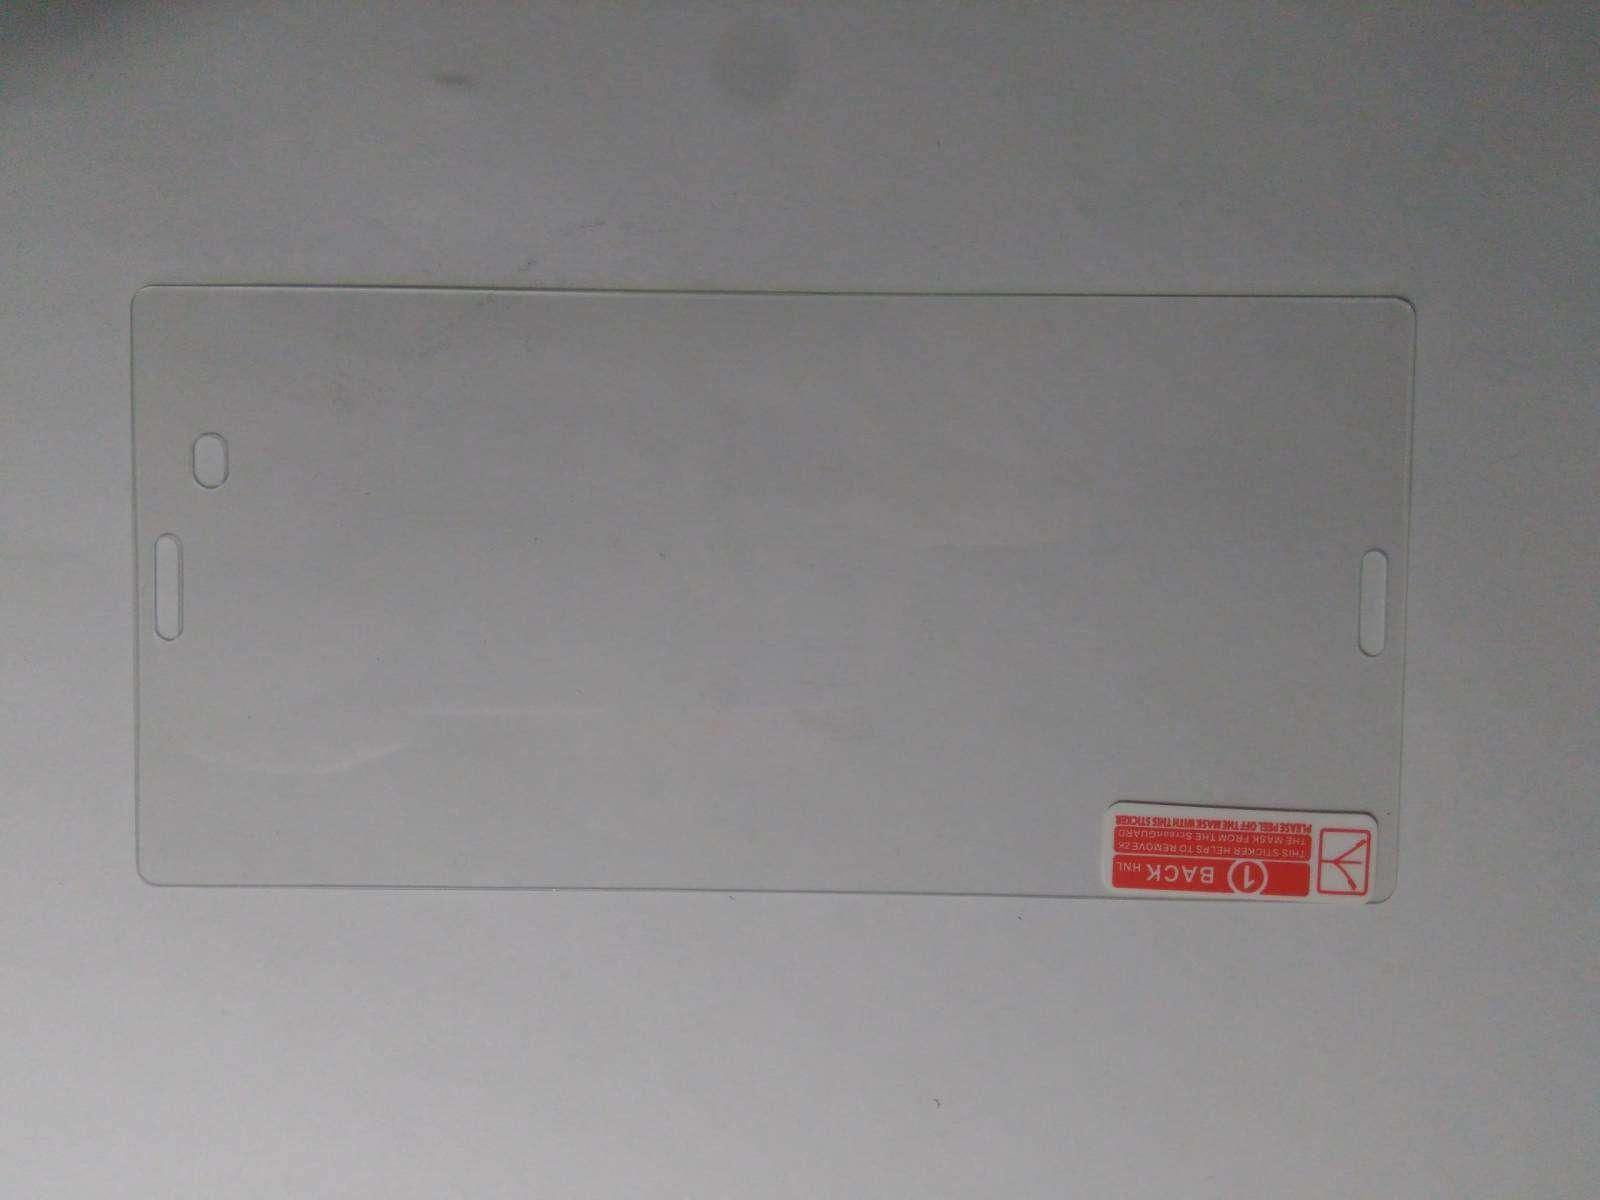 Aliexpress: 10 шт. 0.26 мм 2.5D взрывозащищенных закаленных стекол для сони Z3